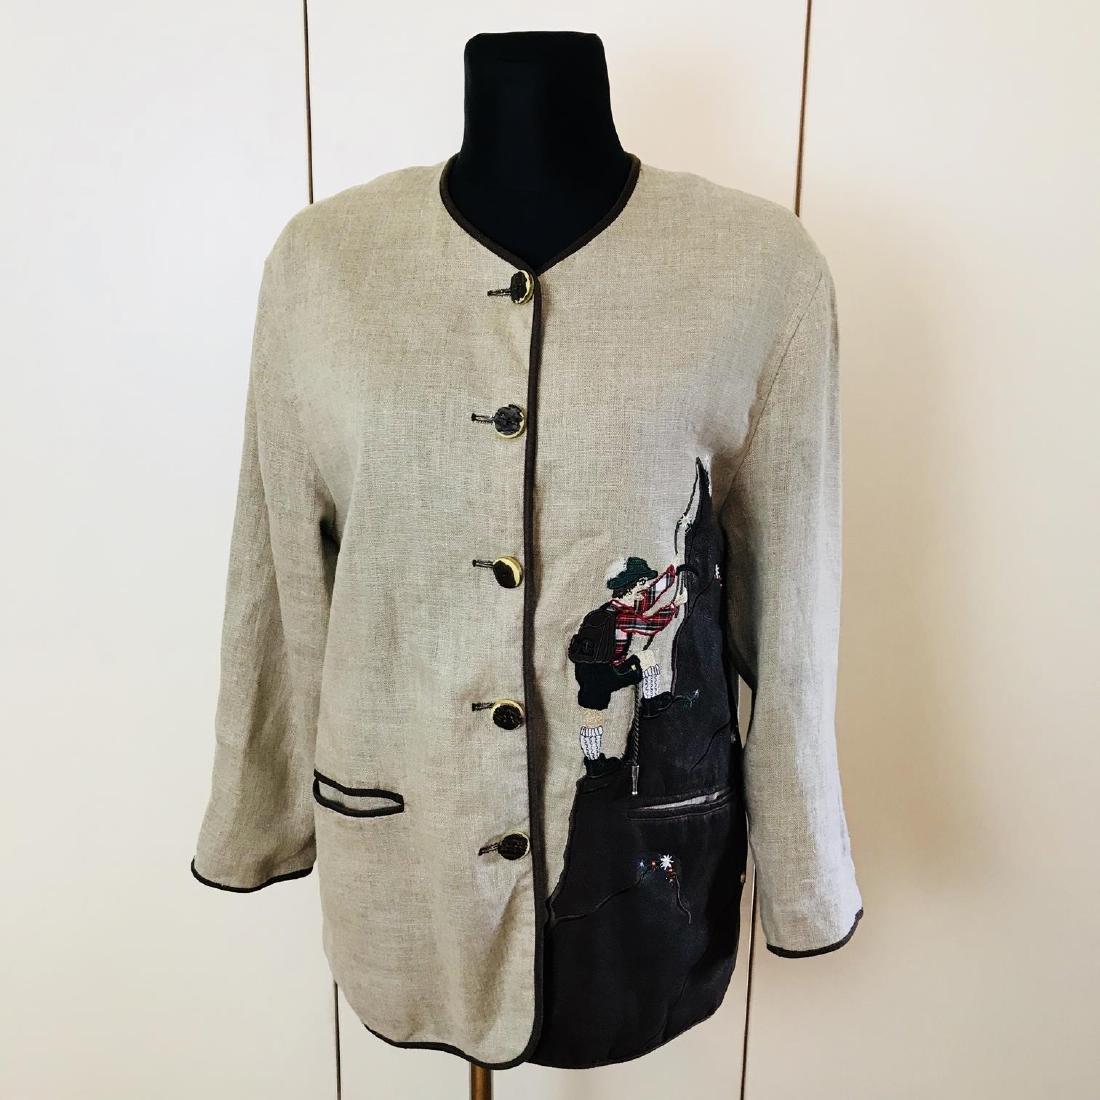 Vintage Women's Linen Tyrolean Style Jacket Size US 20